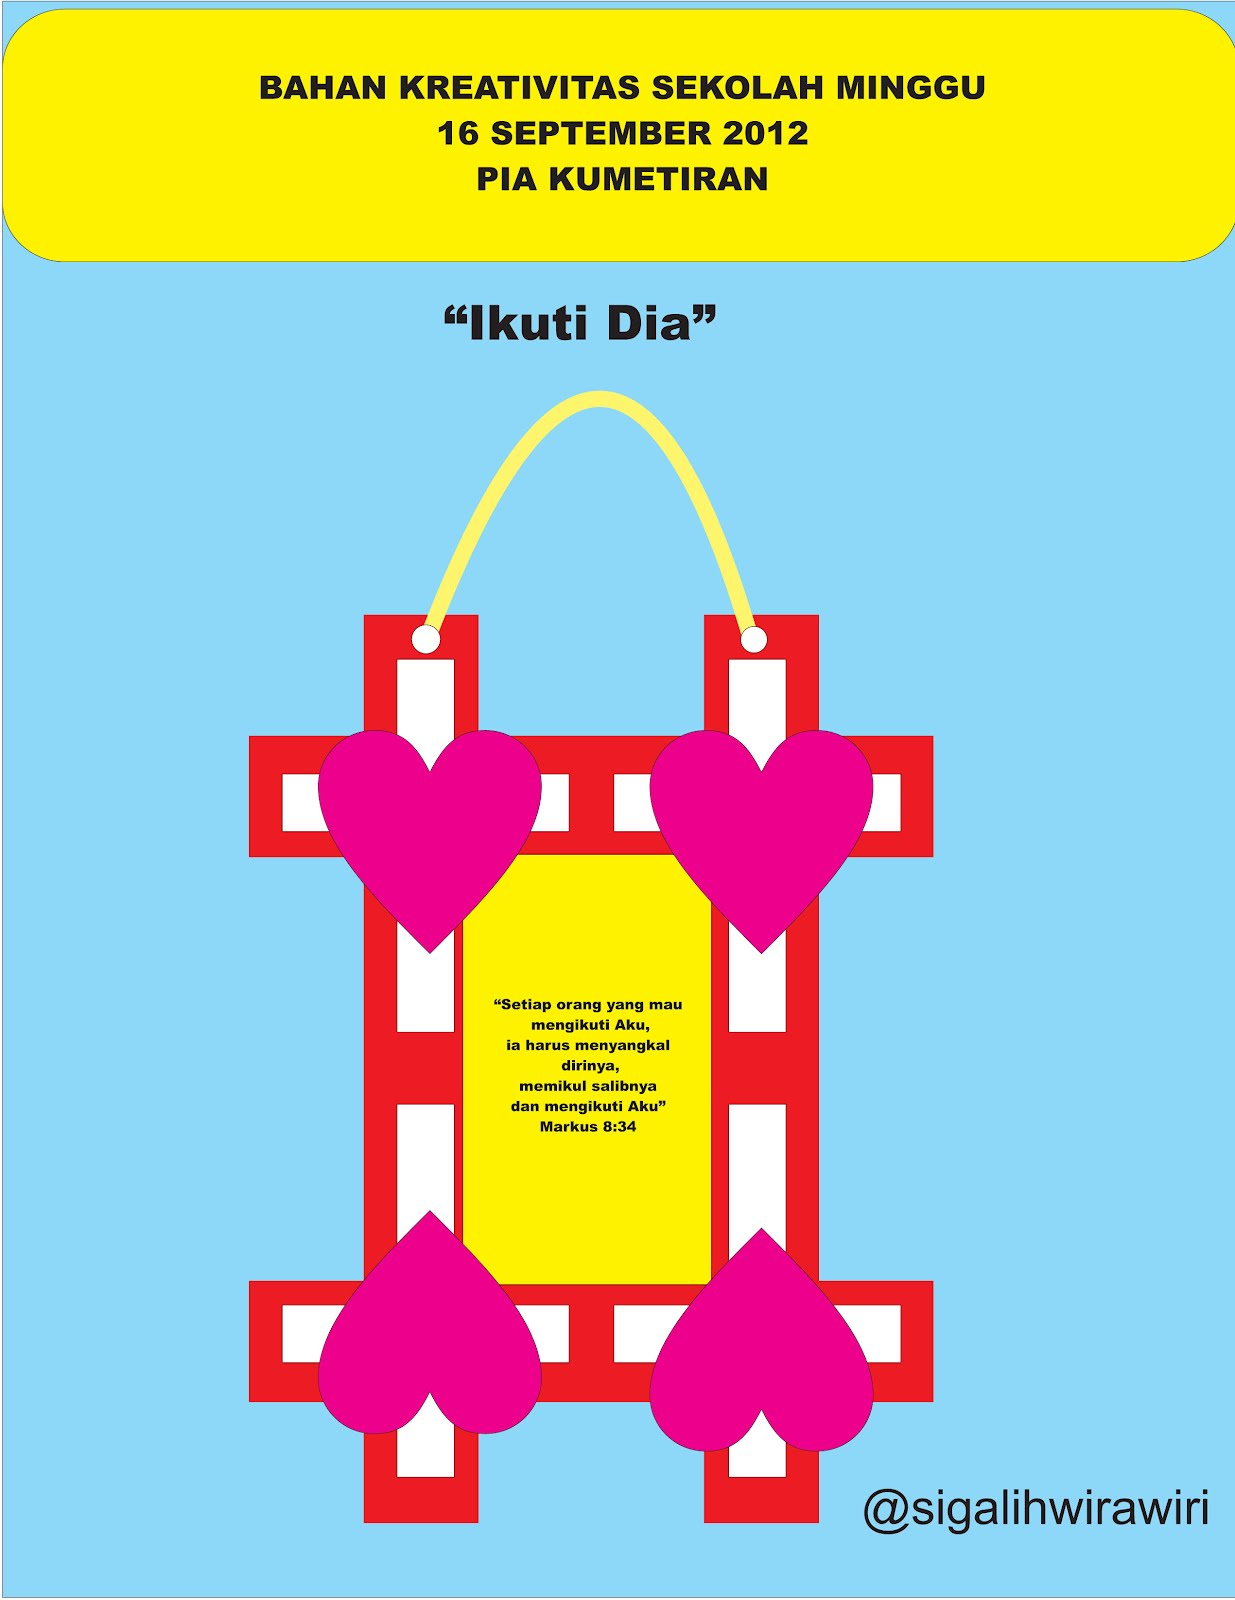 Bahan Kreativitas Sekolah Minggu 16 September 2012 PIA Kumetiran